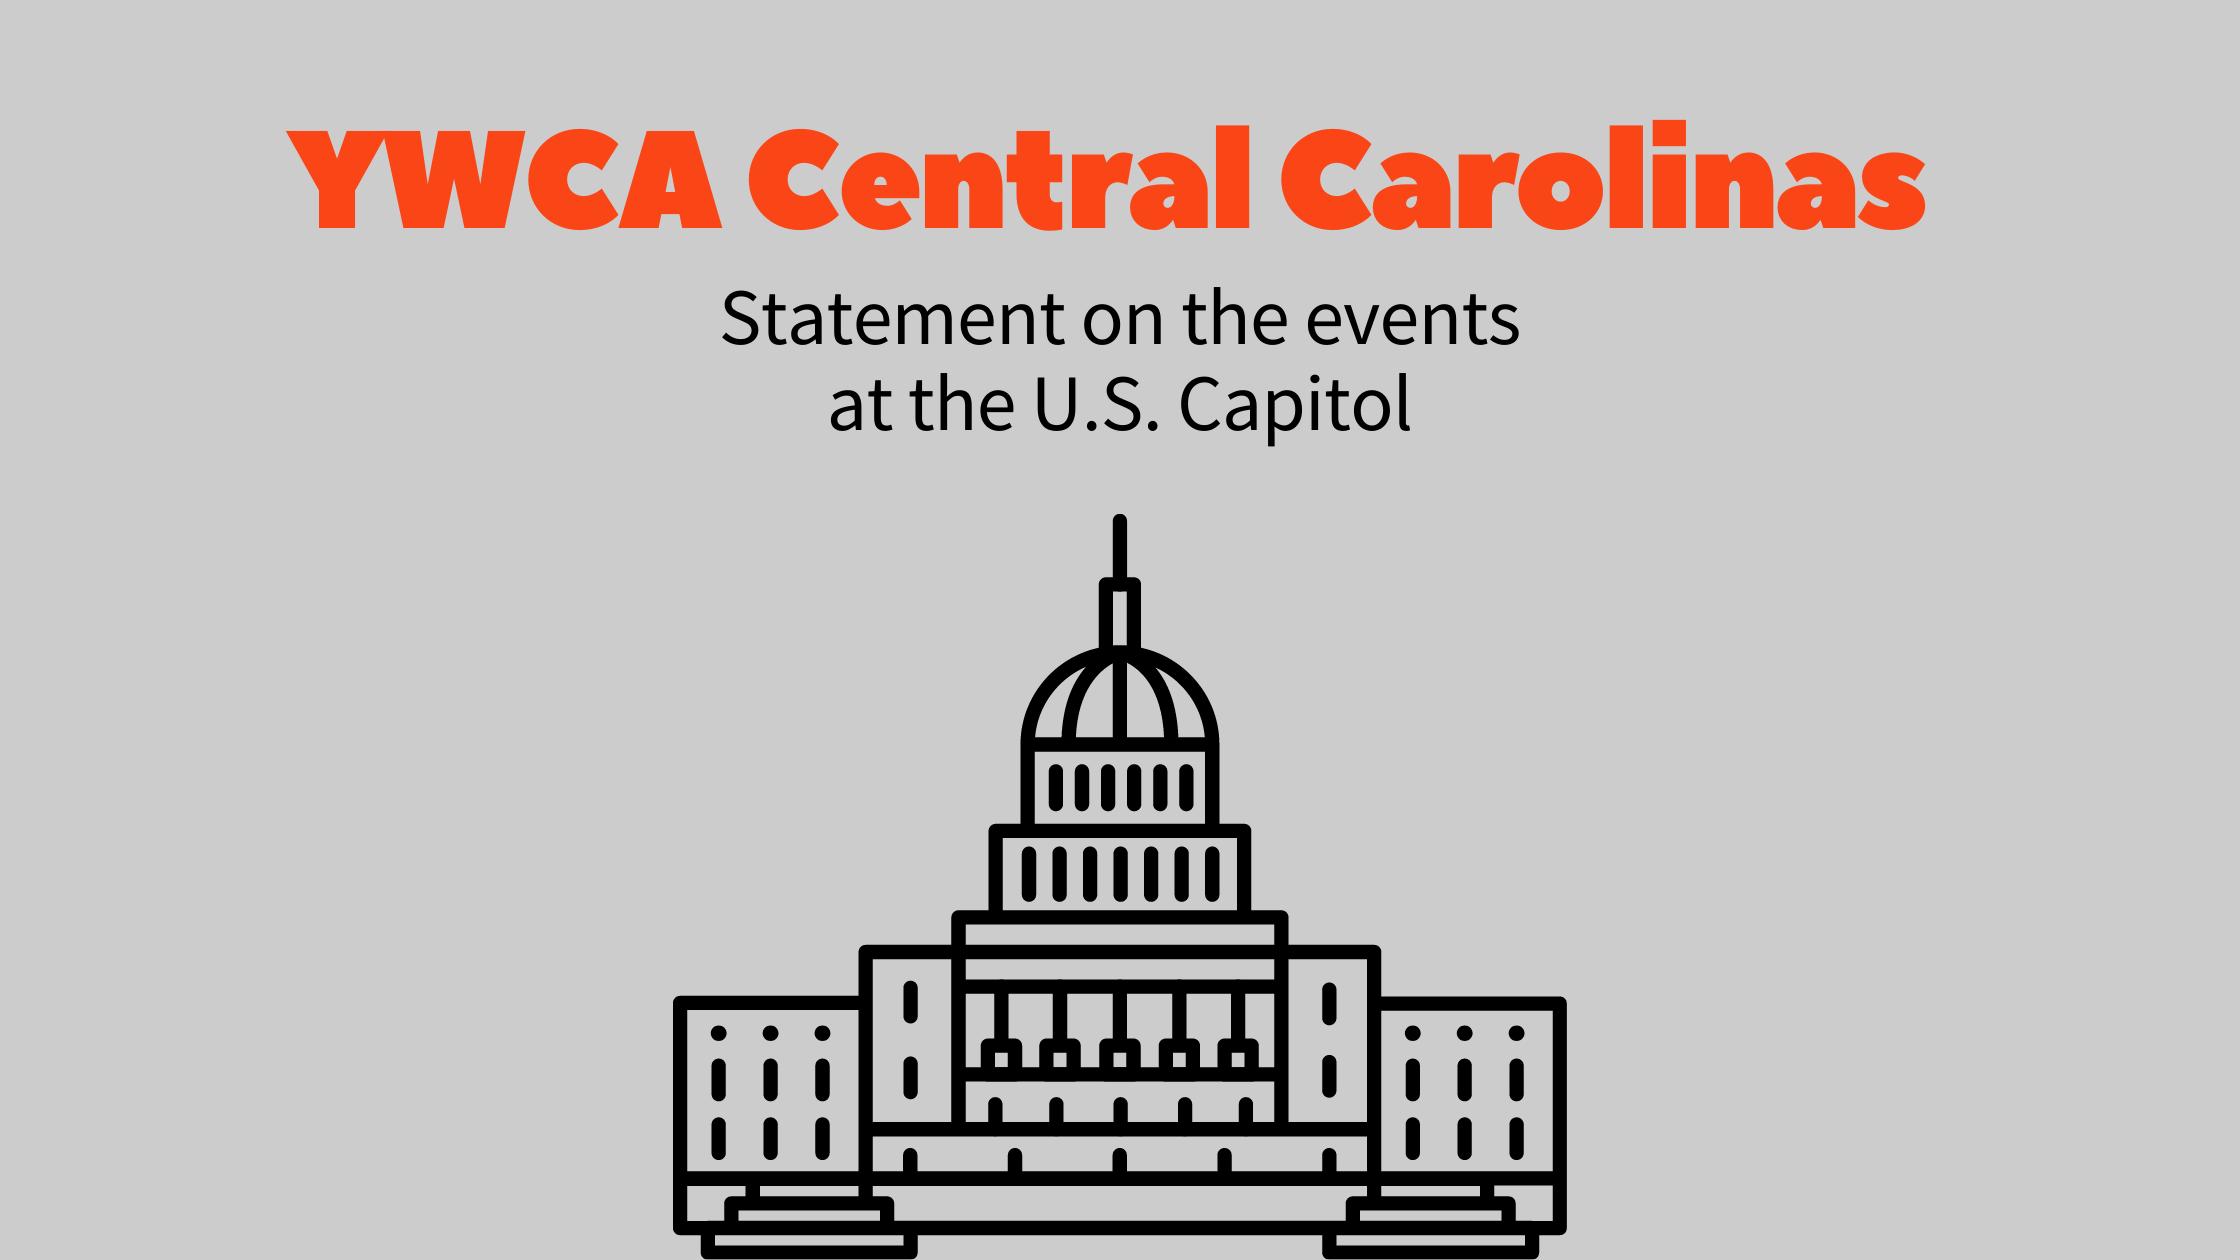 YWCA Central Carolinas condemns domestic terrorism at the US Capitol